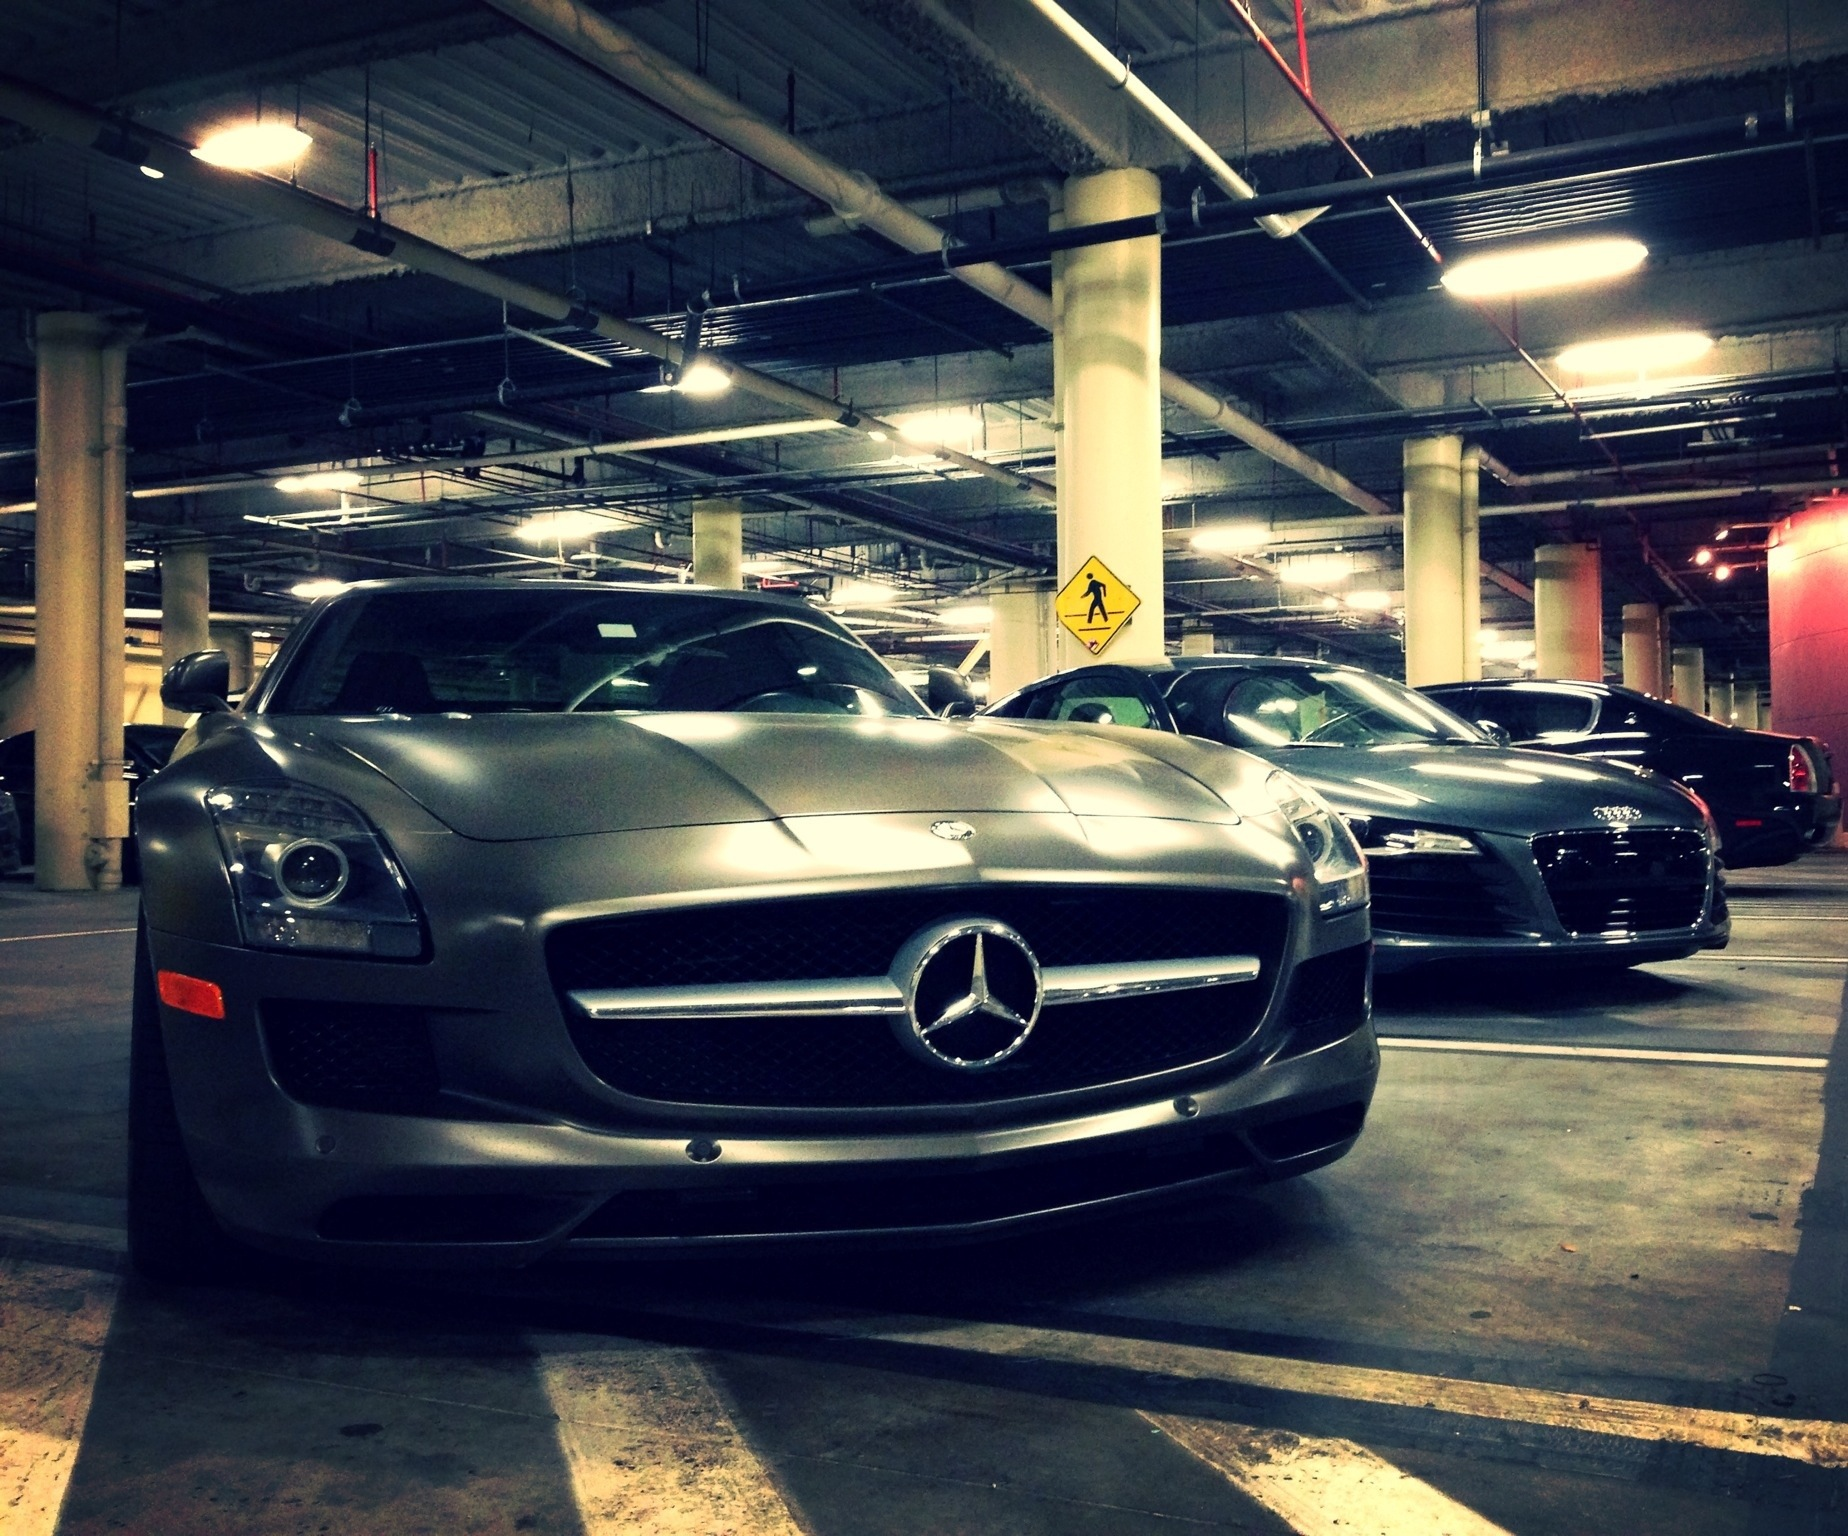 Mercedes benz sls amg audi r8 v8 10 6 speed 36thumbsup for Mercedes benz instagram